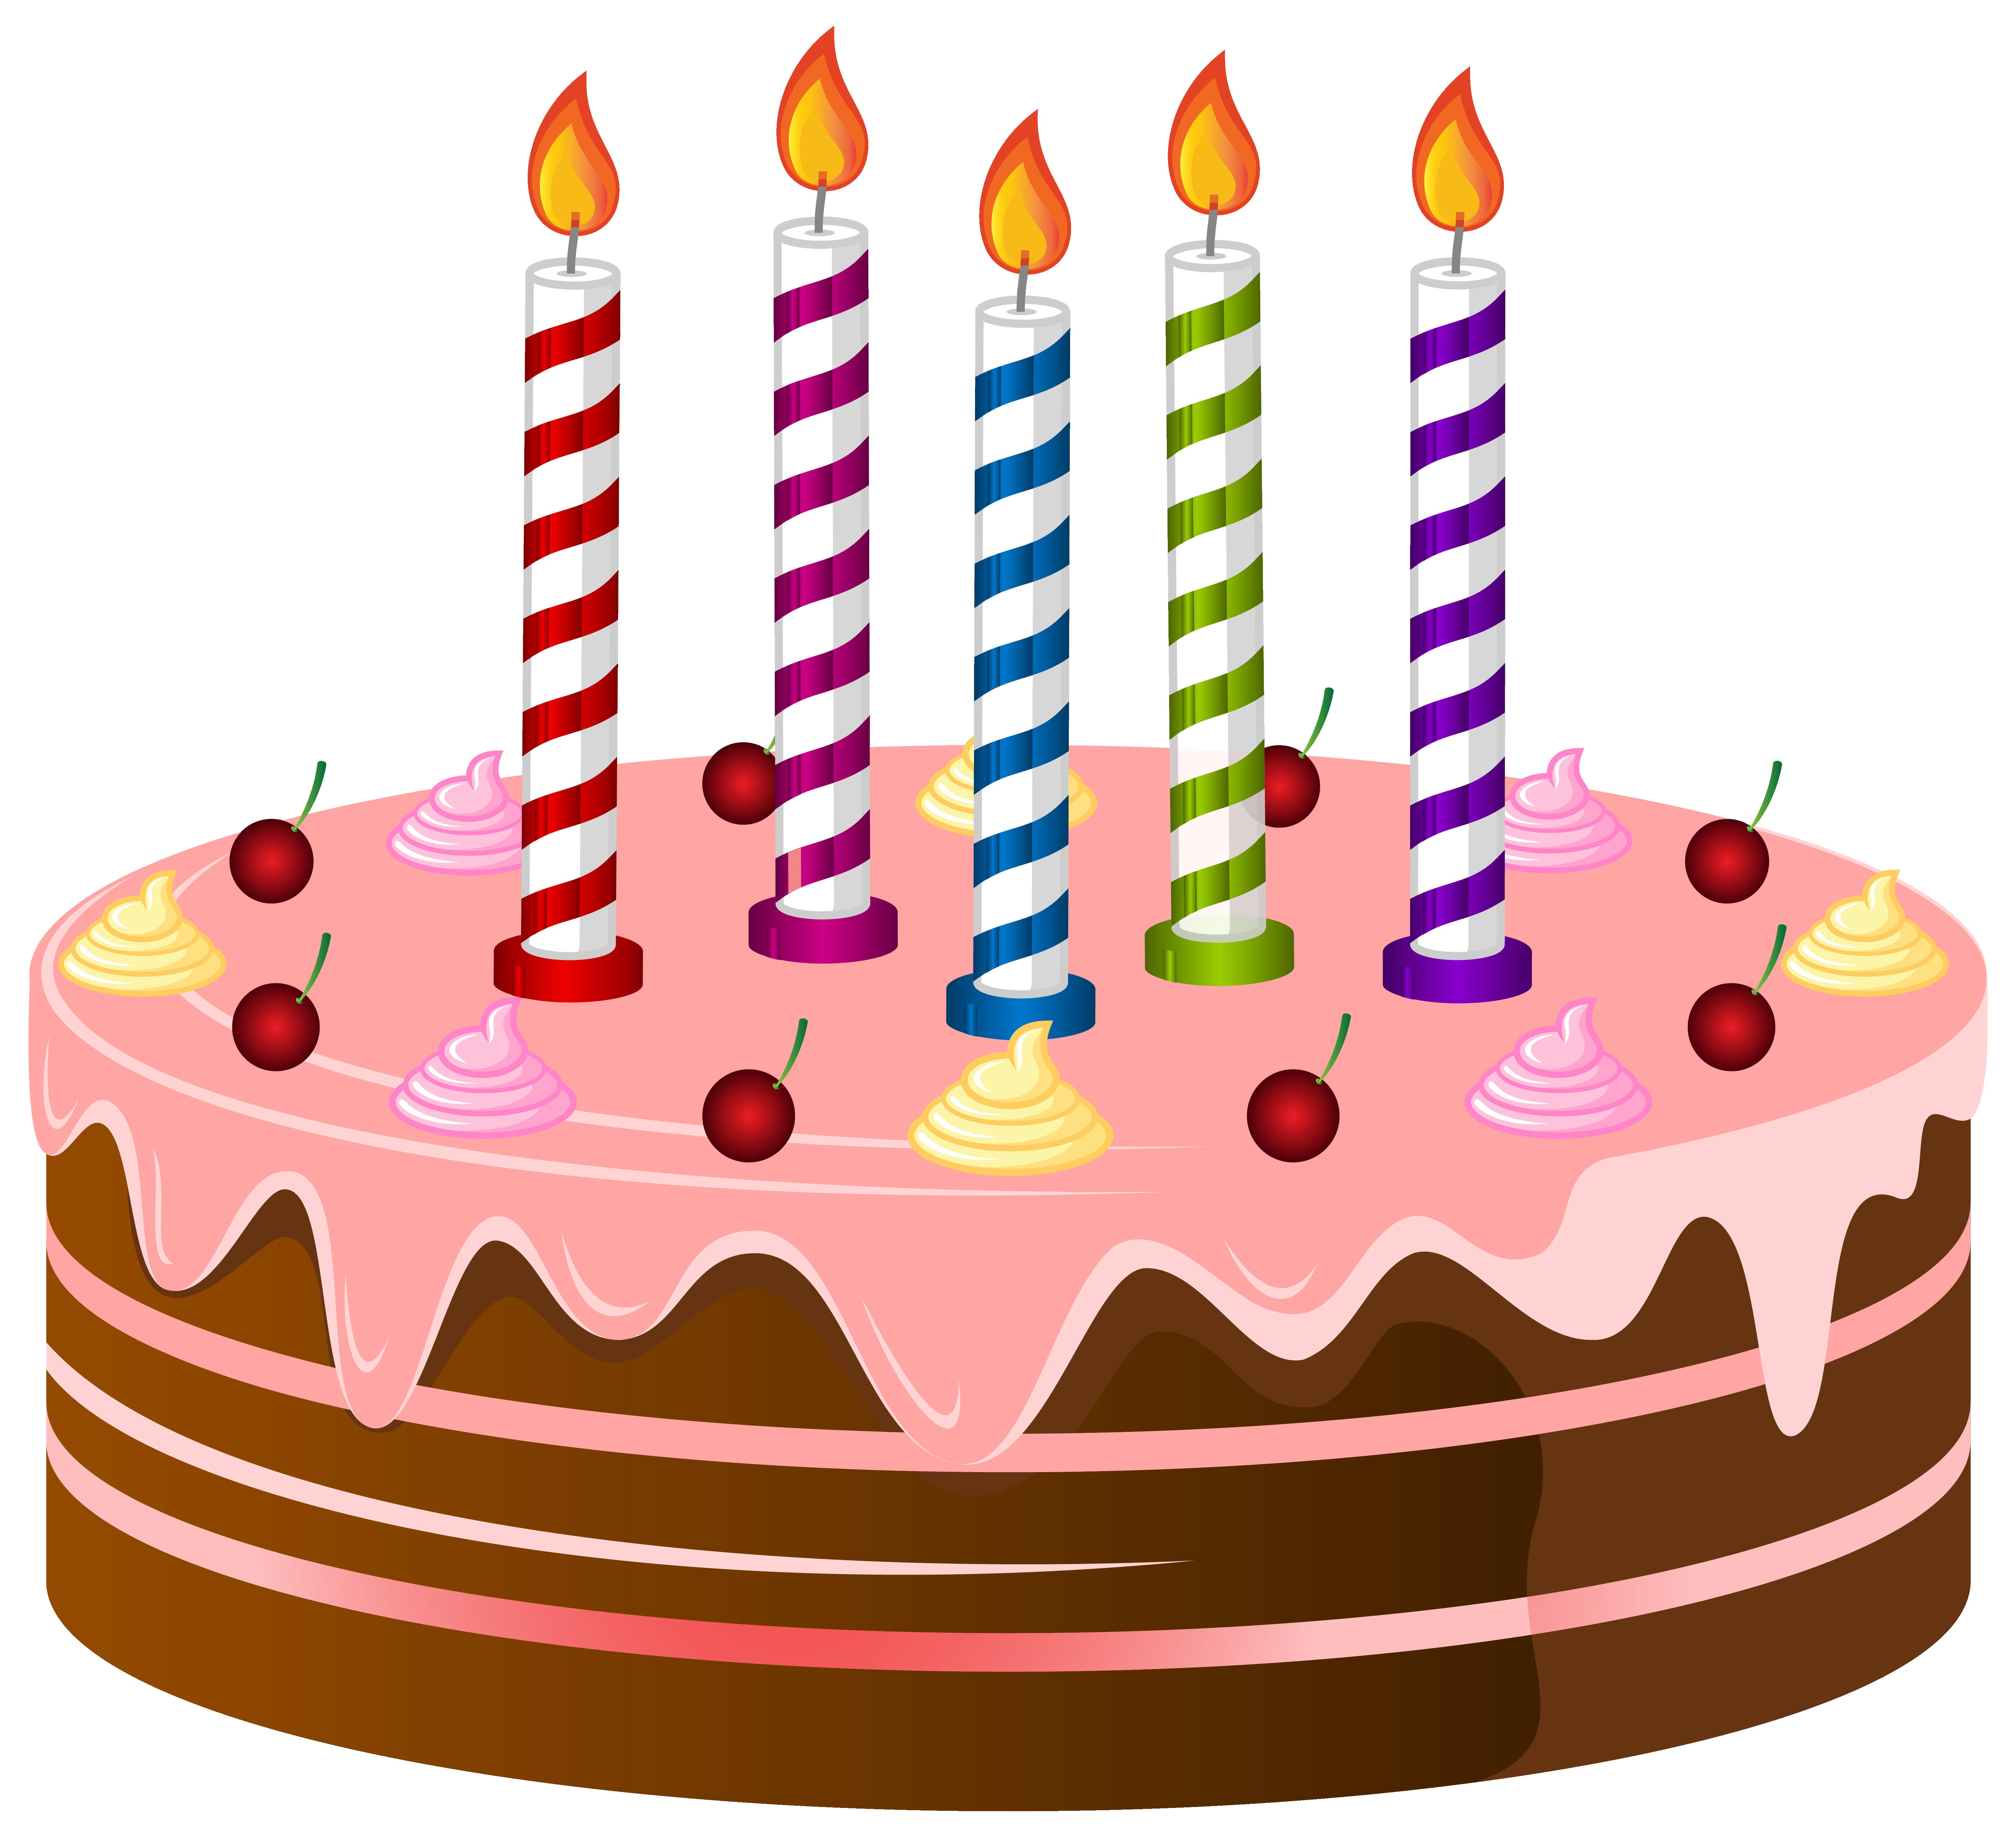 free photo birthday cake clipart pie clipart candles non rh jooinn com clip art cake pictures clip art cake photos